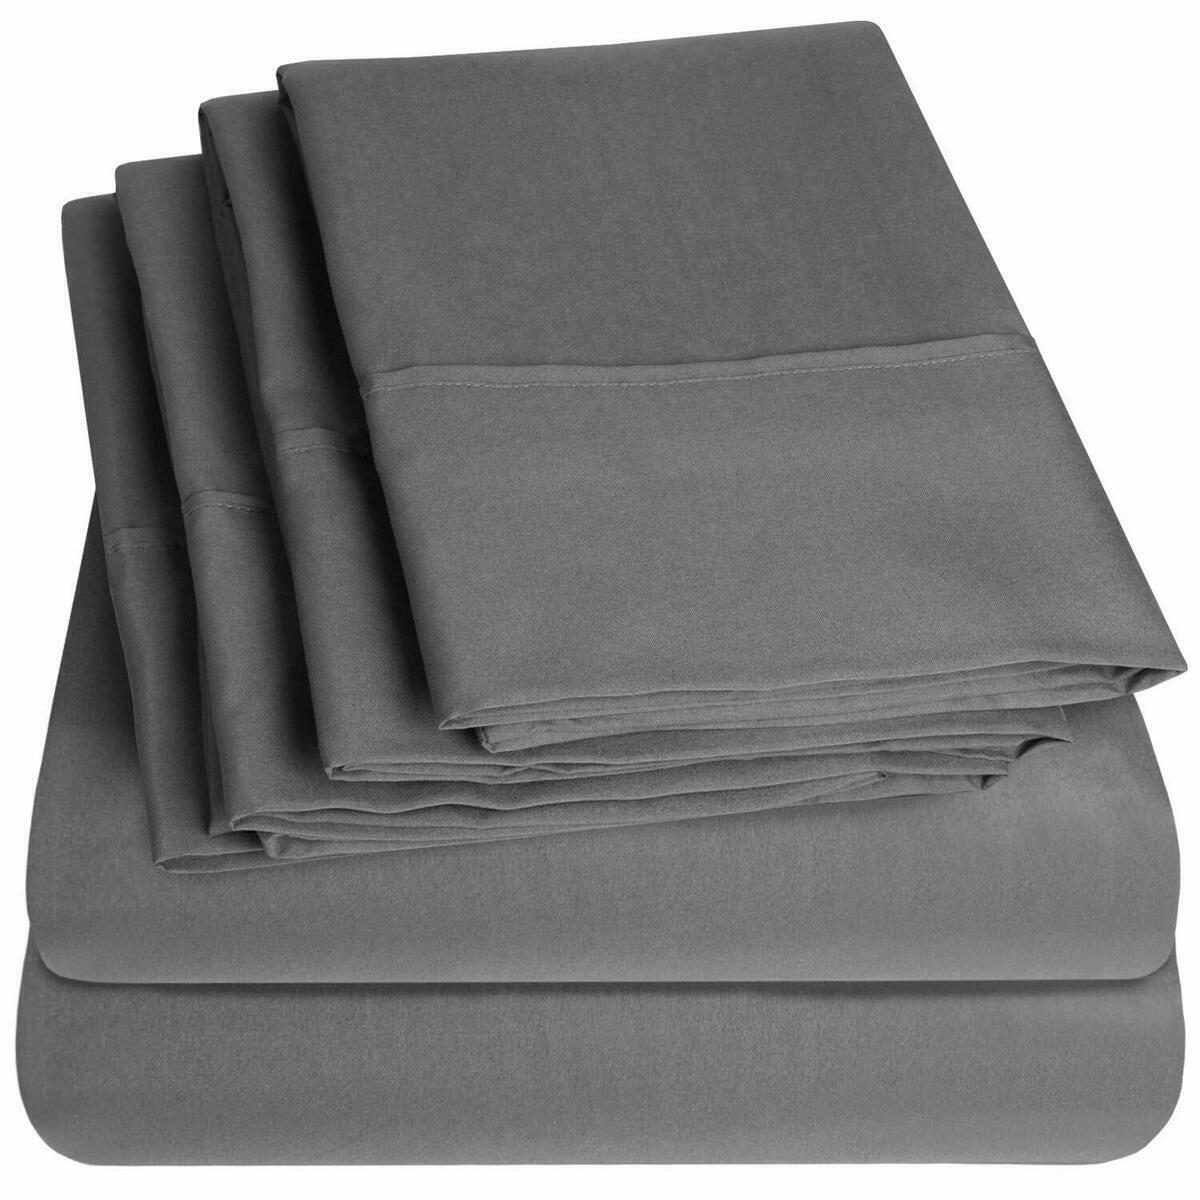 Egyptian Cotton Queen Size Bed Sheets Sheet Set Deep Pocket